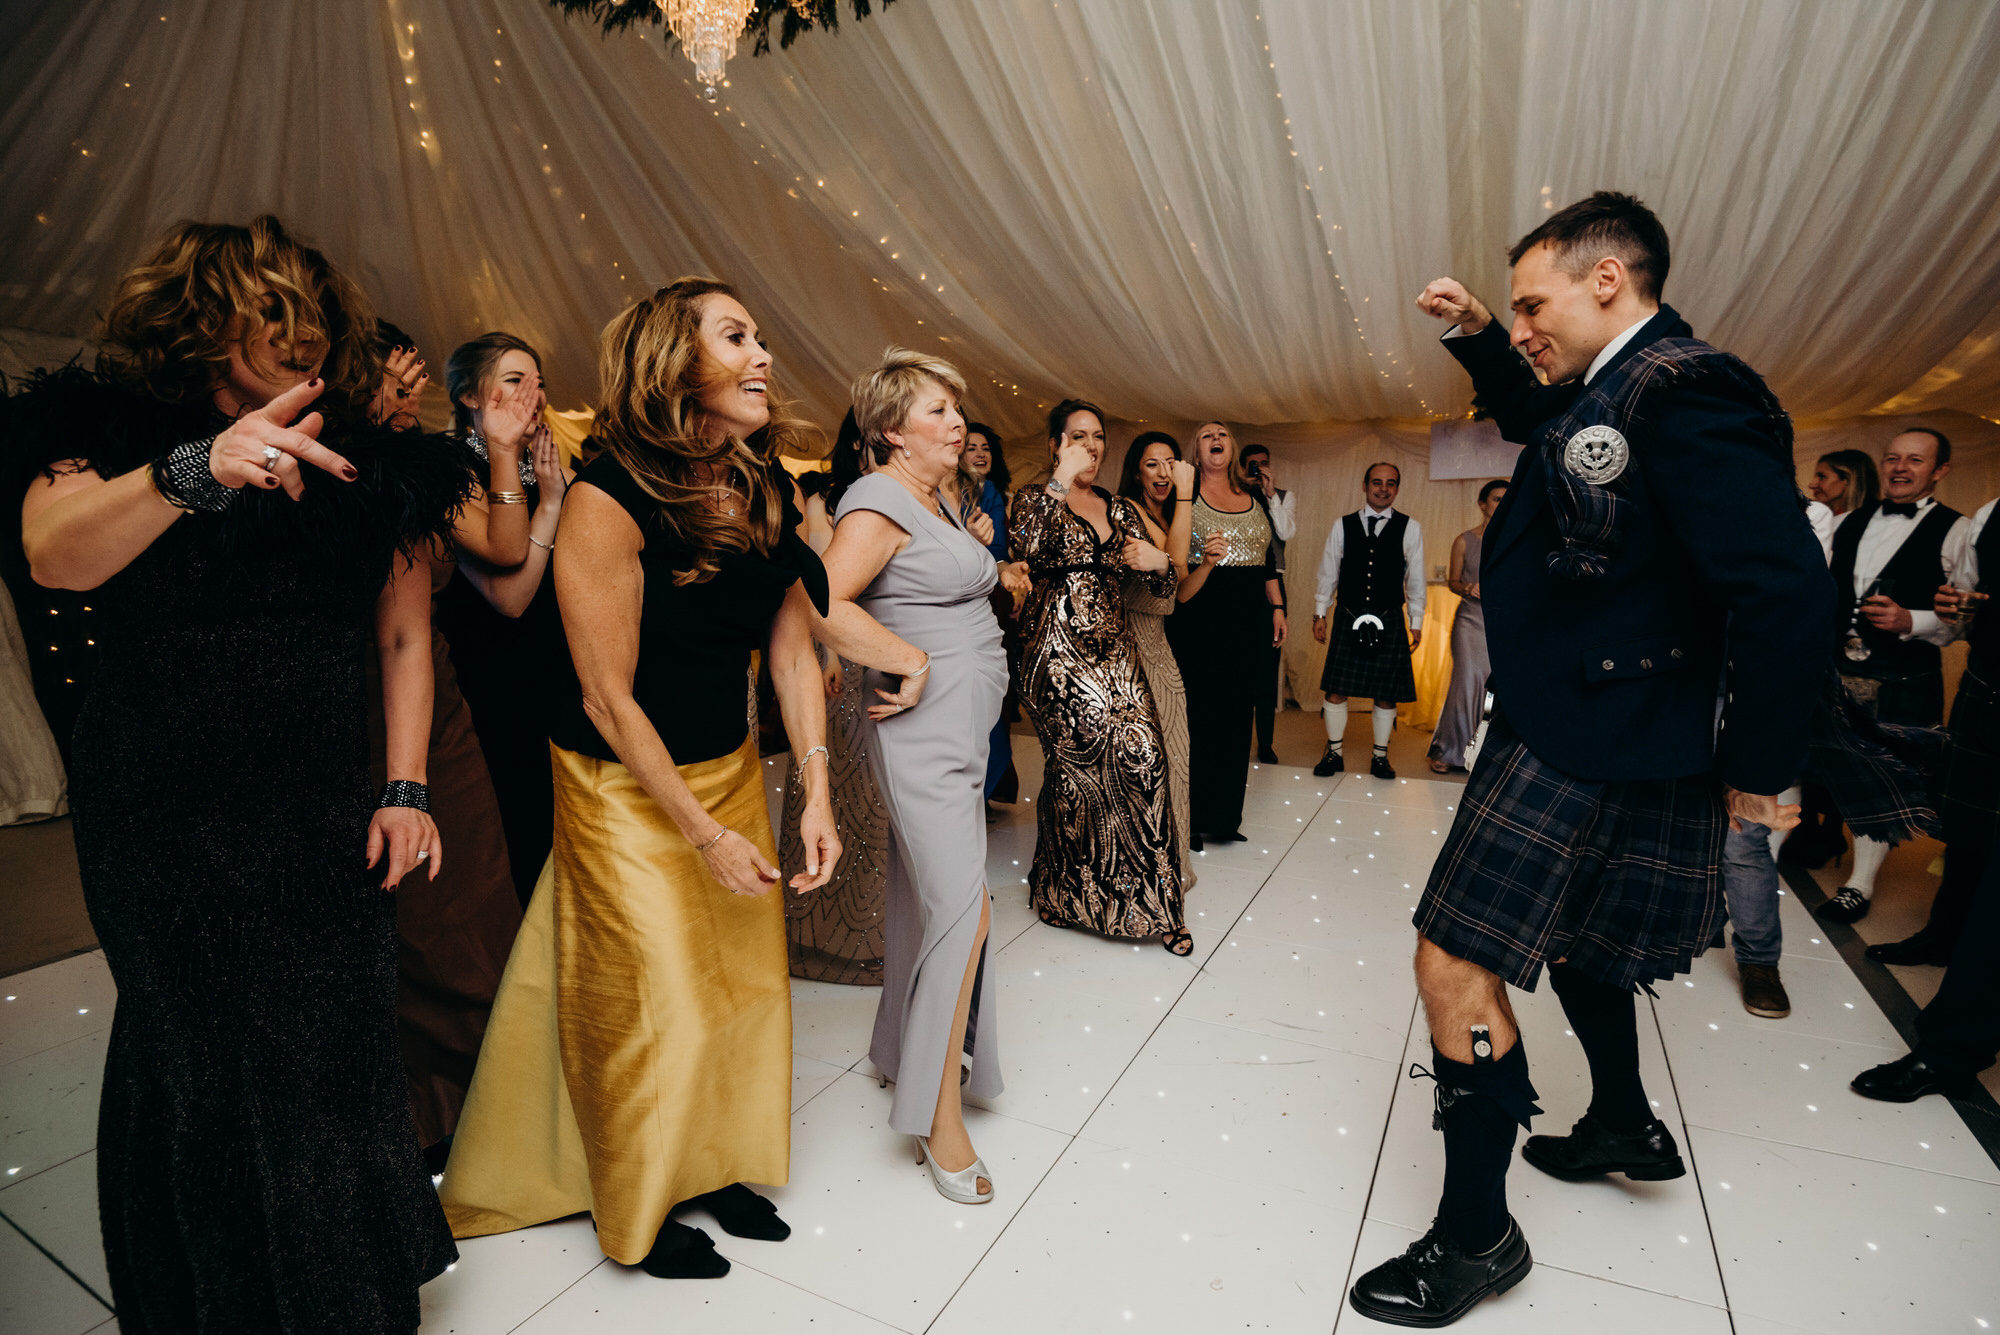 Girls Dancing at Duntreath Castle wedding